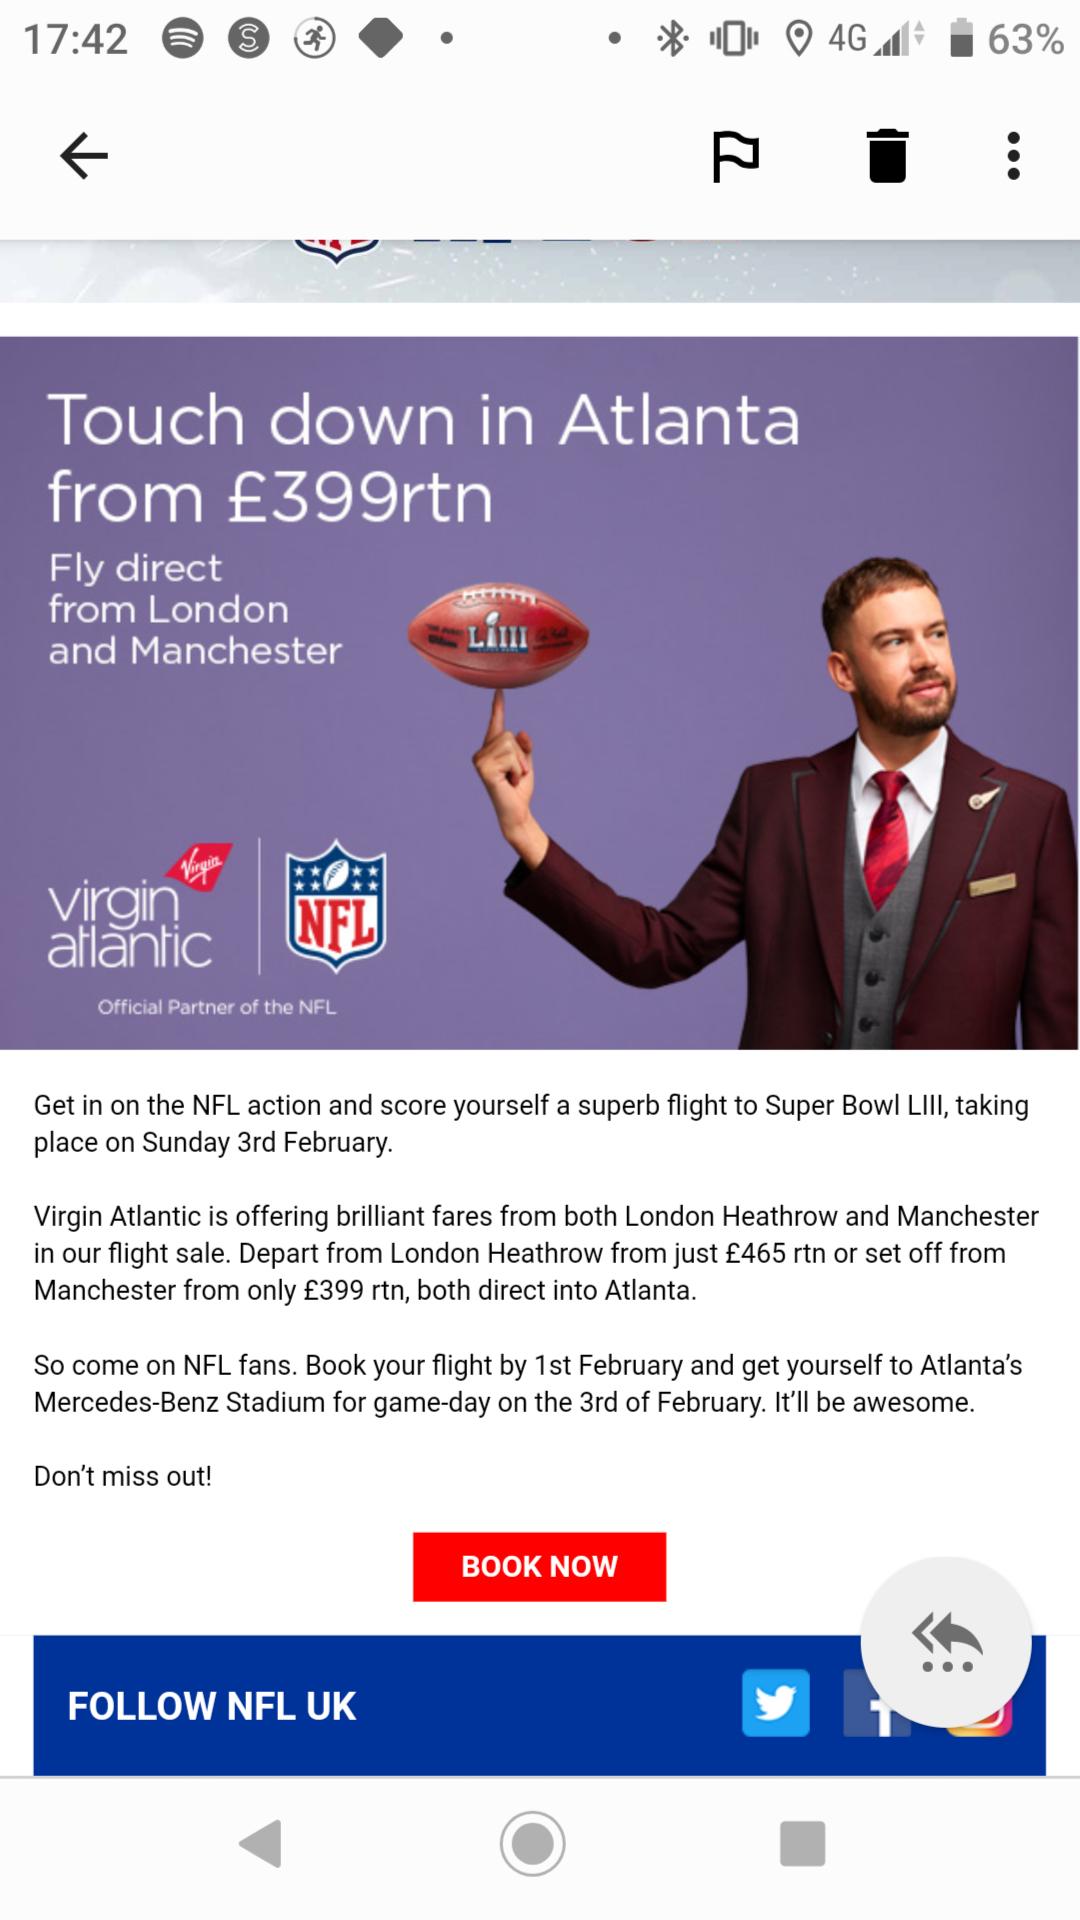 Flights to Atlanta from London Heathrow and Manchester £399 @ Virgin atlantic